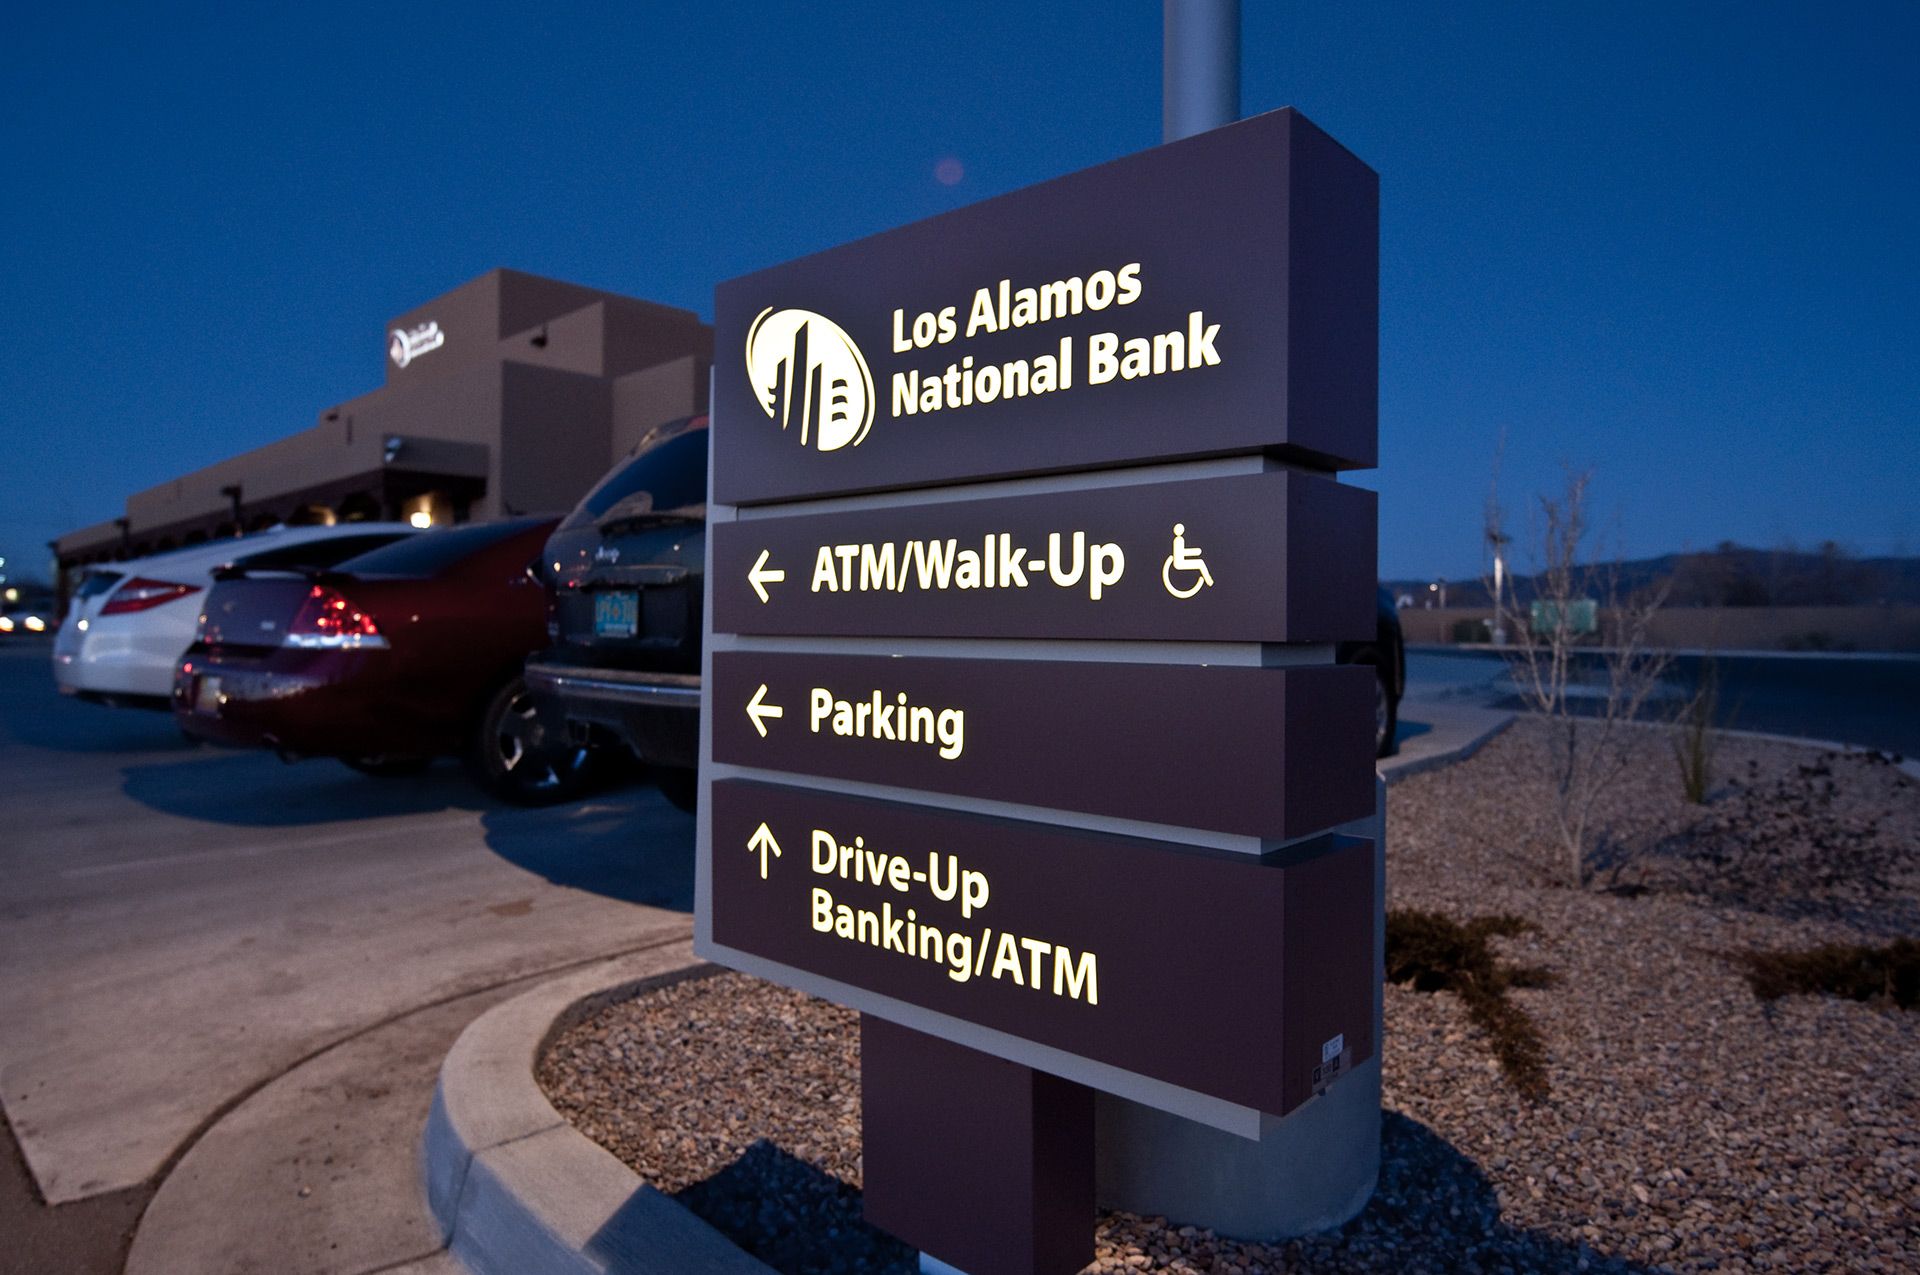 Los Alamos Bank - Exterior Wayfinding